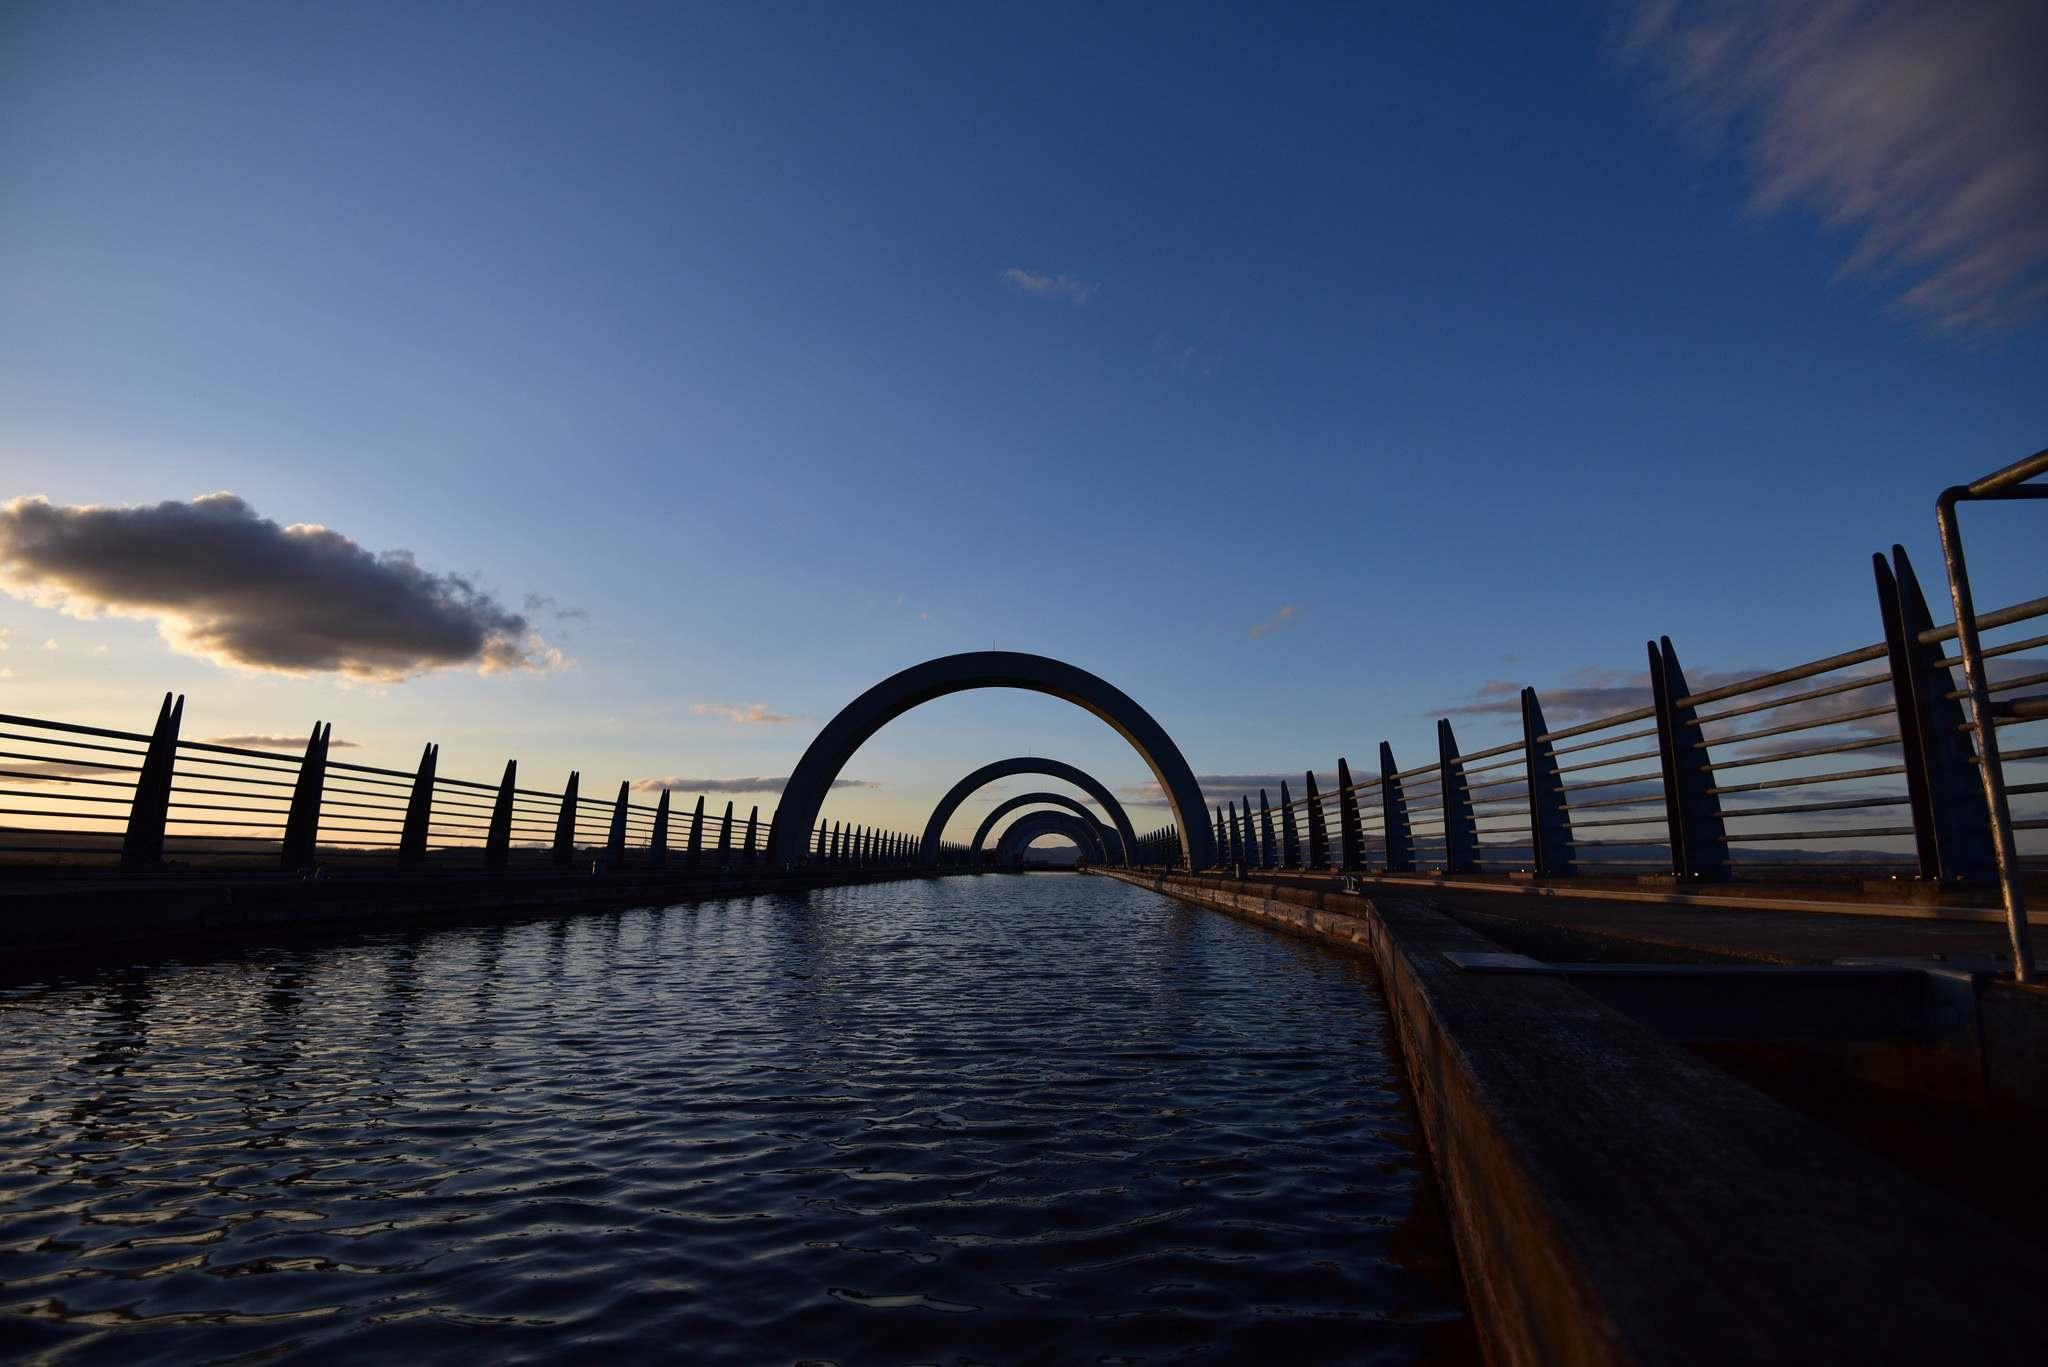 falkirk wheel8 The Falkirk Wheel   Rotating Boat Lift in Scotland